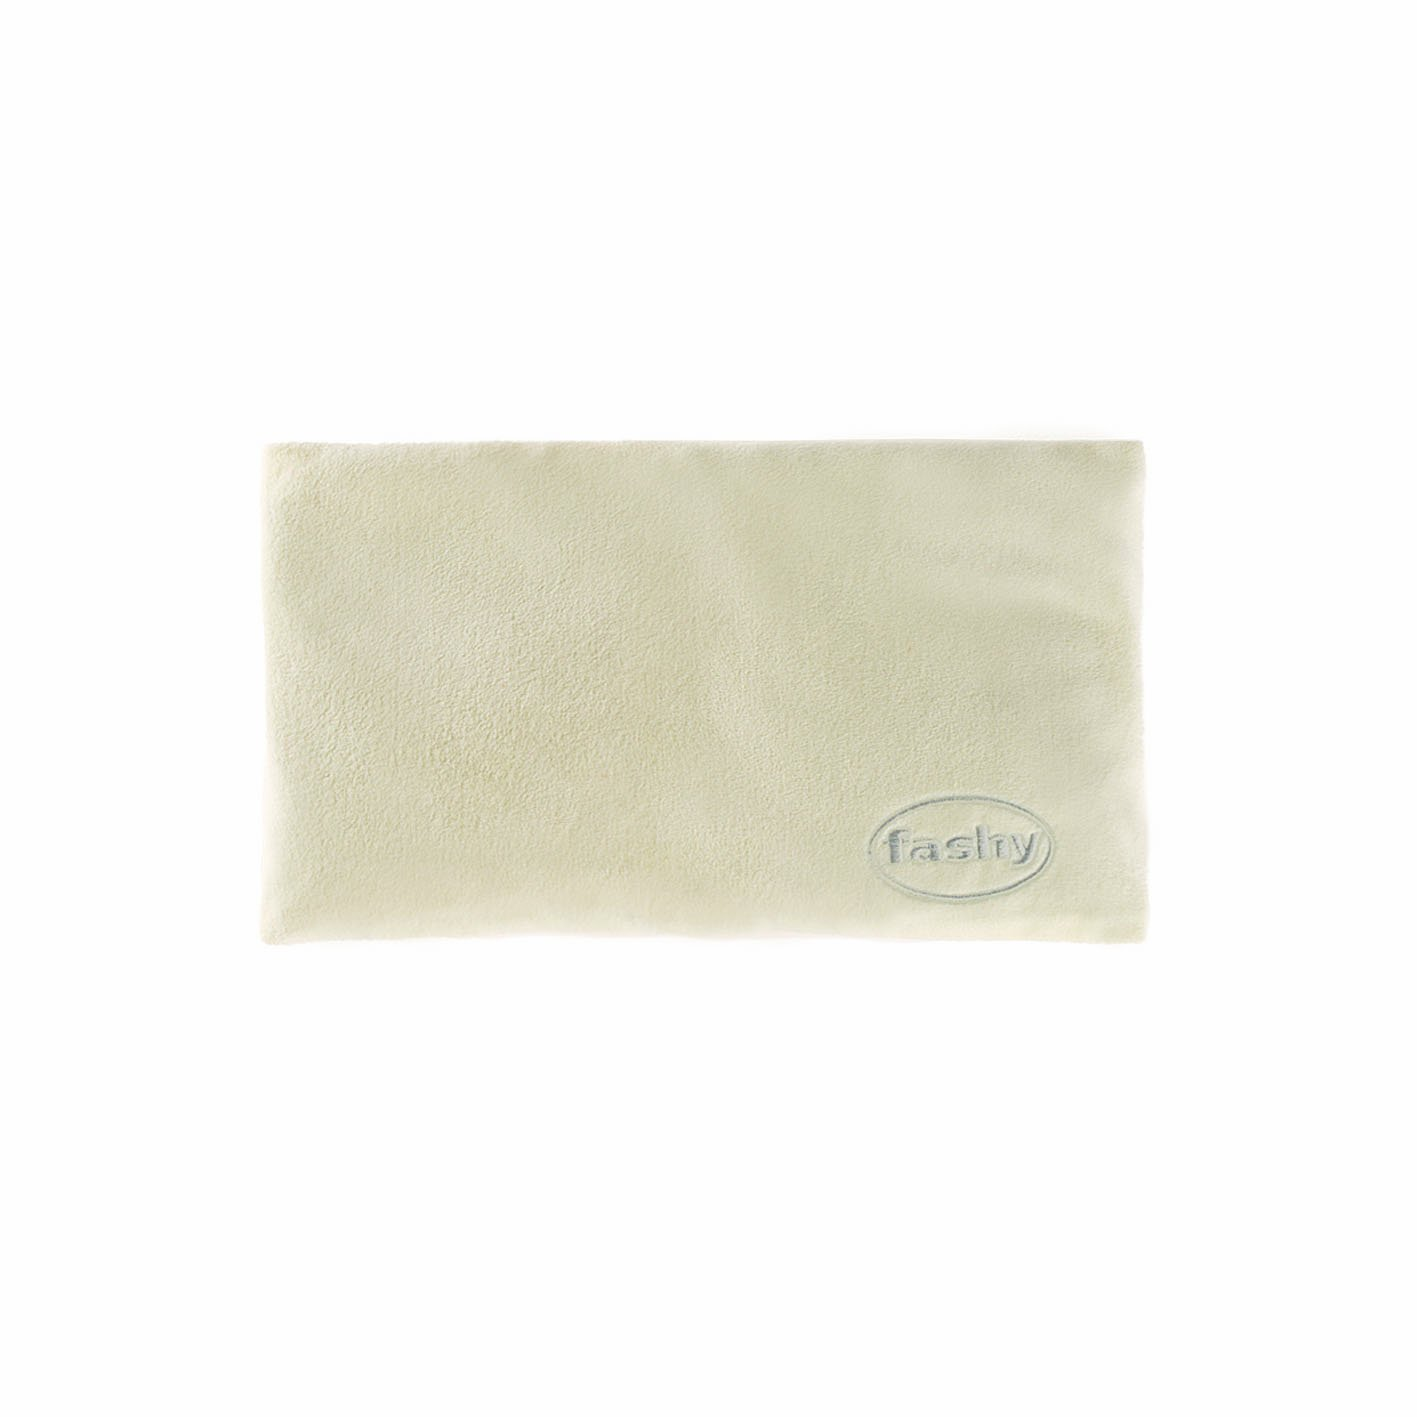 Fashy 6331 Heat Cushion with Rape Seed Filling Fashy GmbH